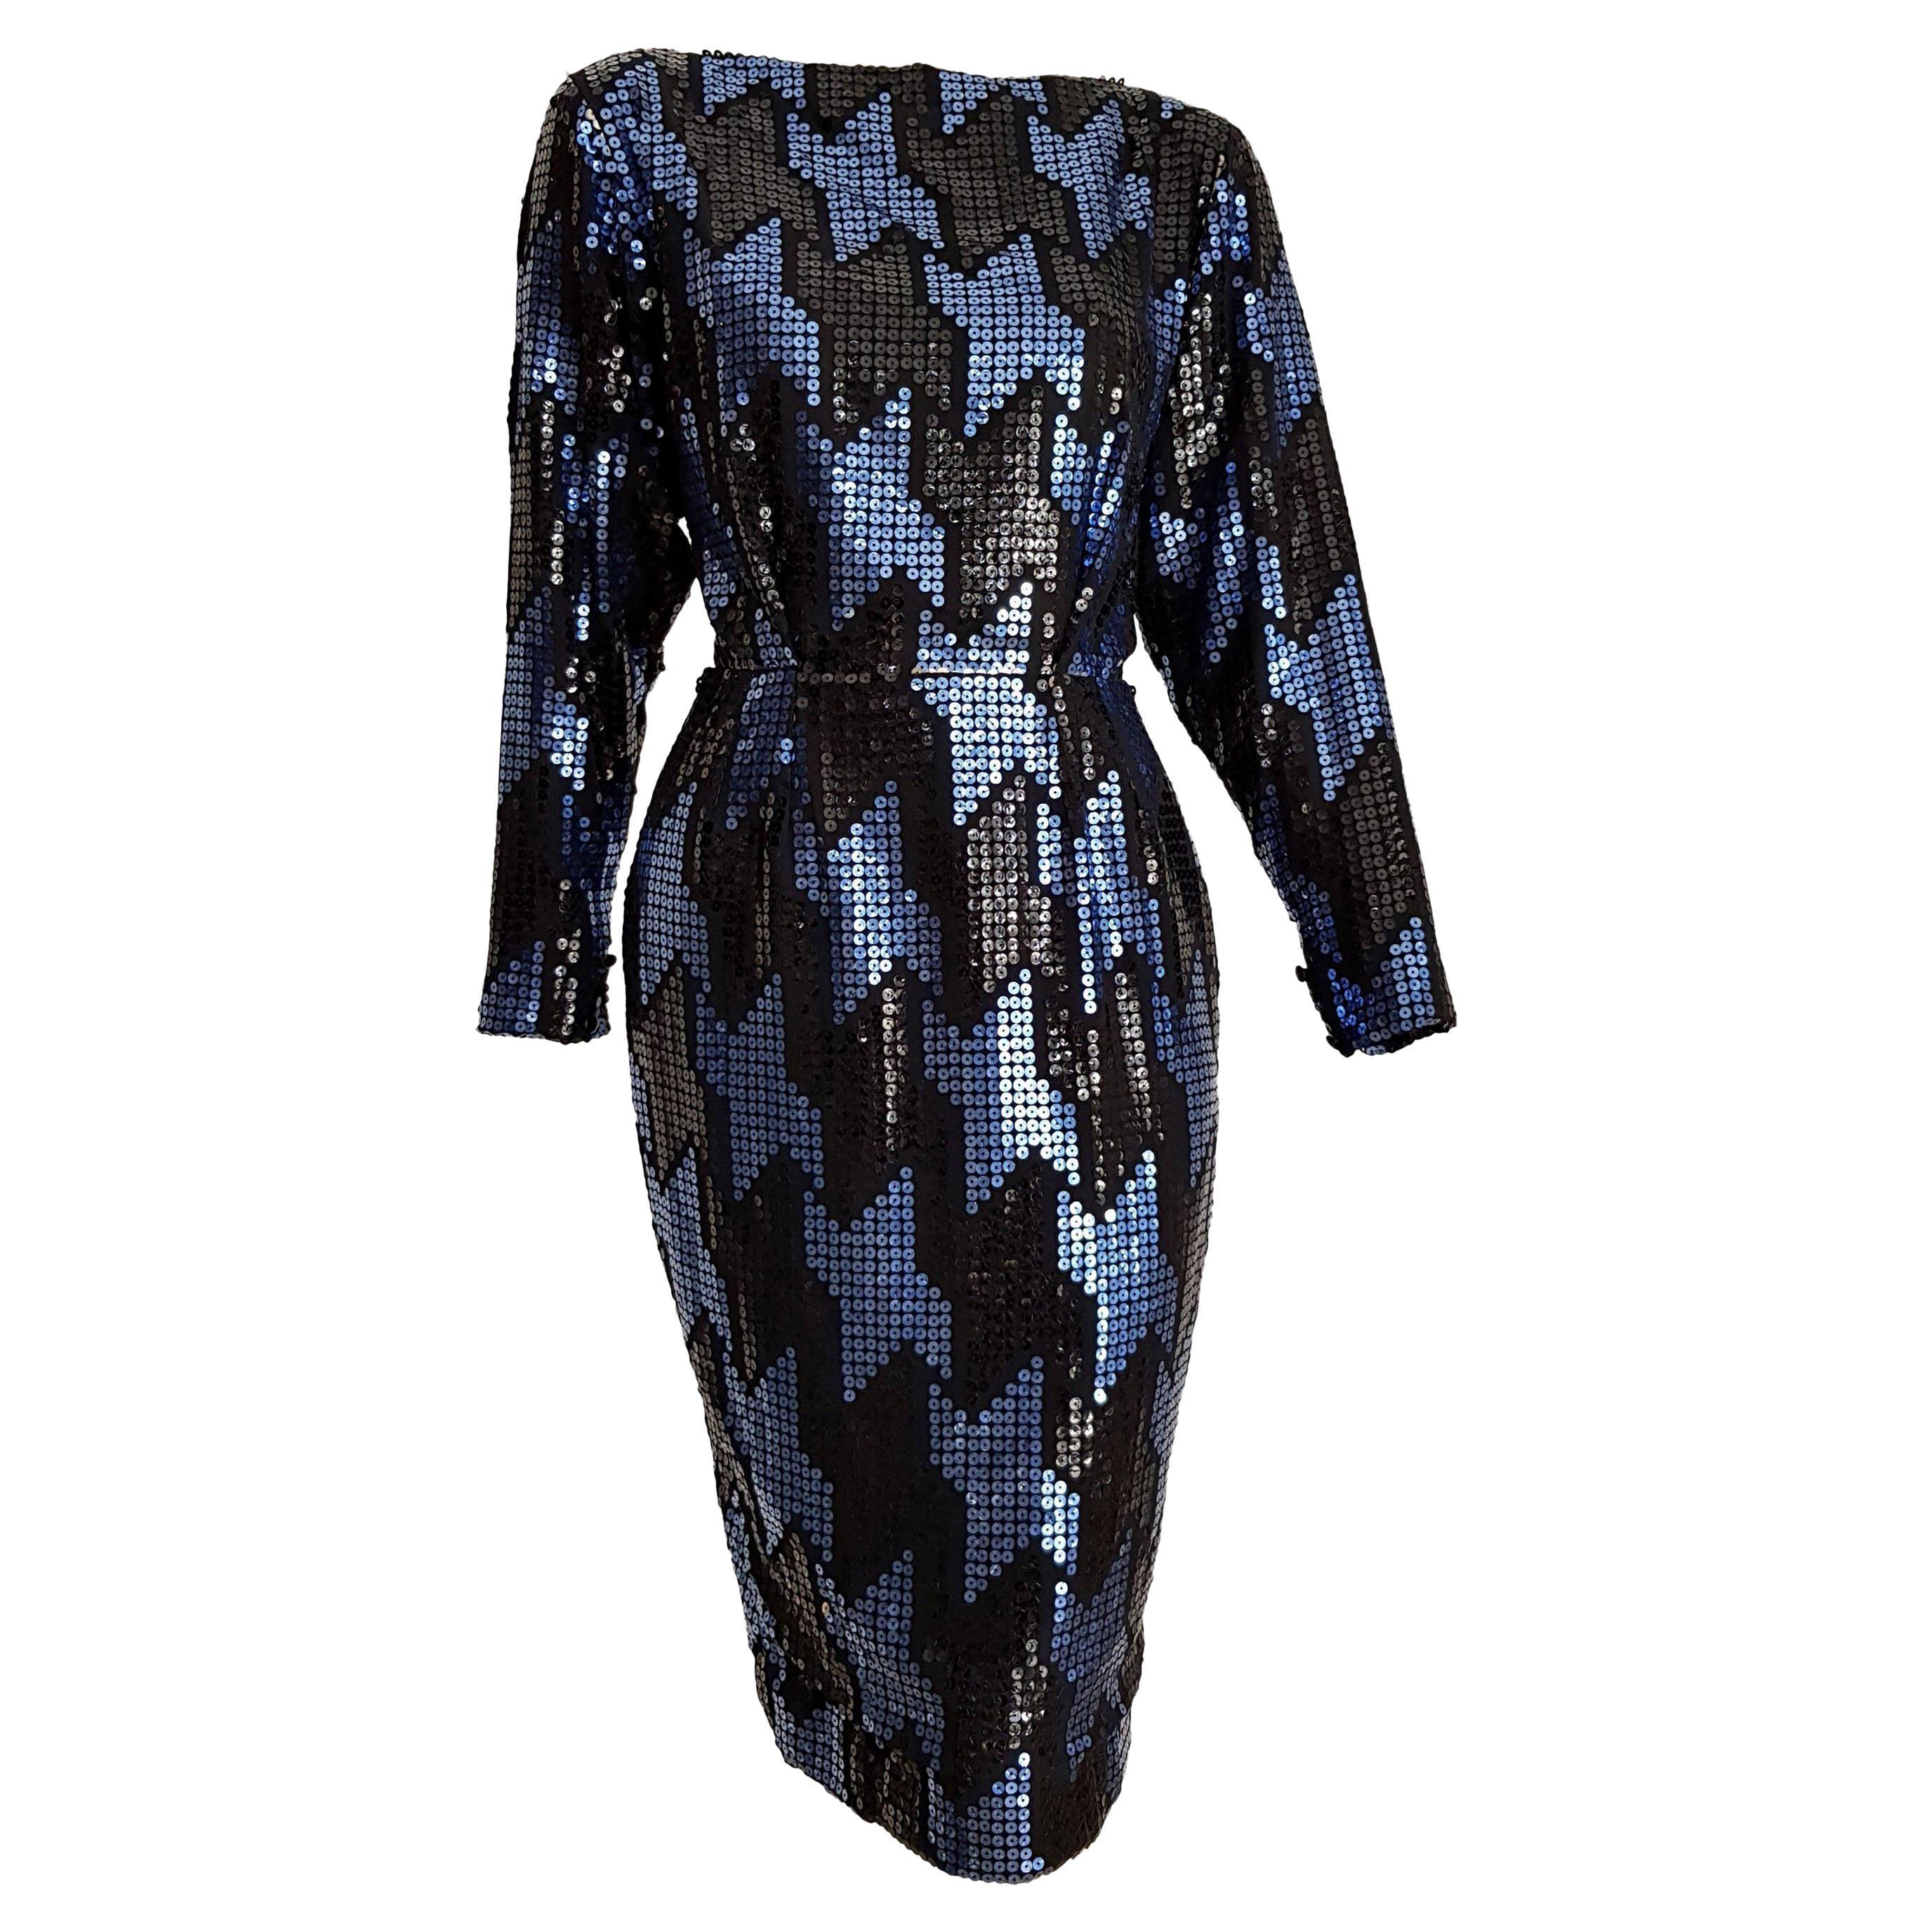 454f7999c2 Vintage Christian Dior Day Dresses - 177 For Sale at 1stdibs